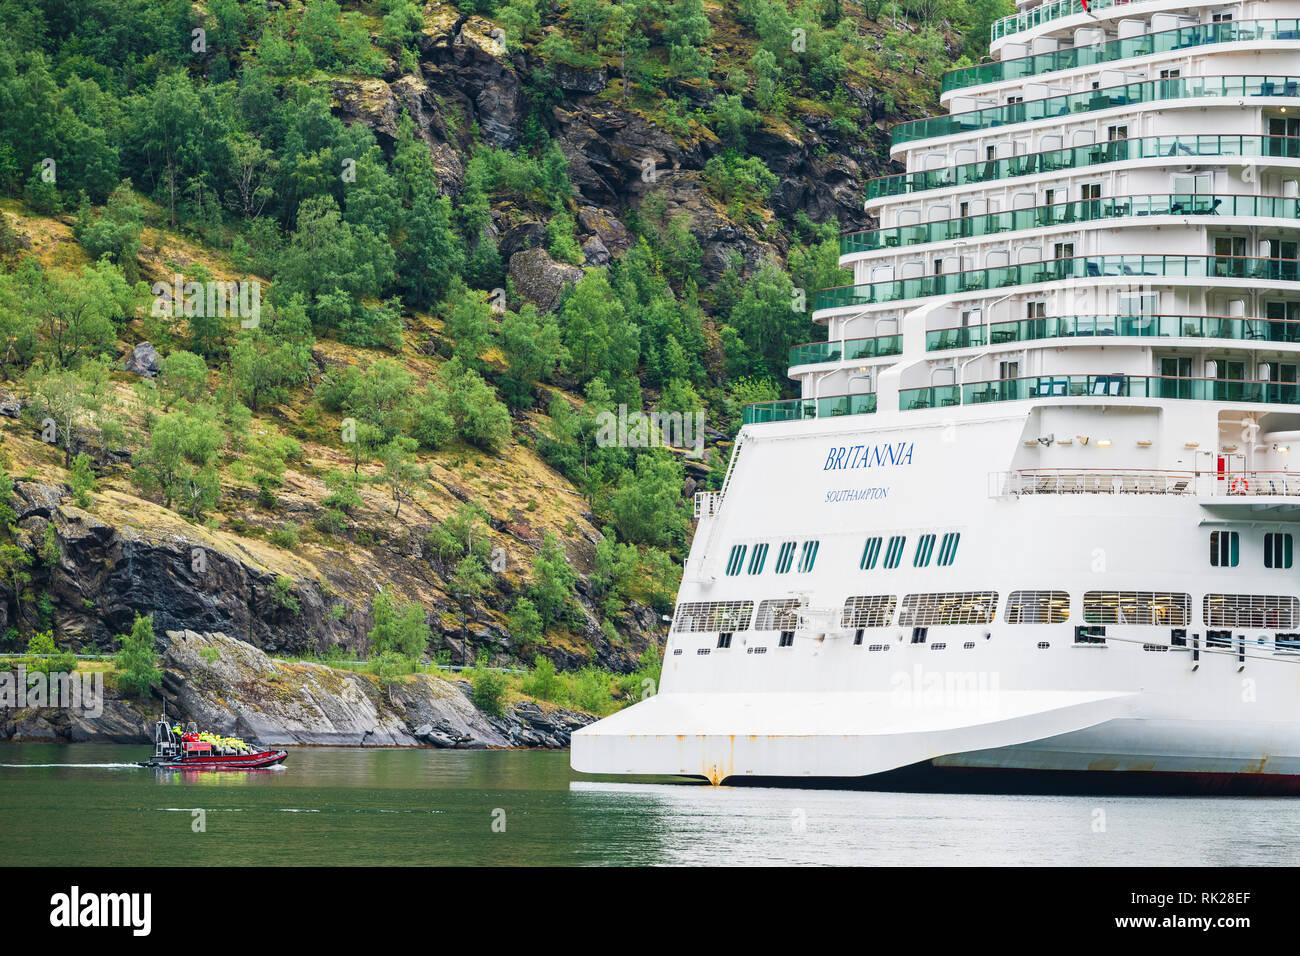 Pilot boat guiding cruise ship through river, Flam, Norway, Europe - Stock Image